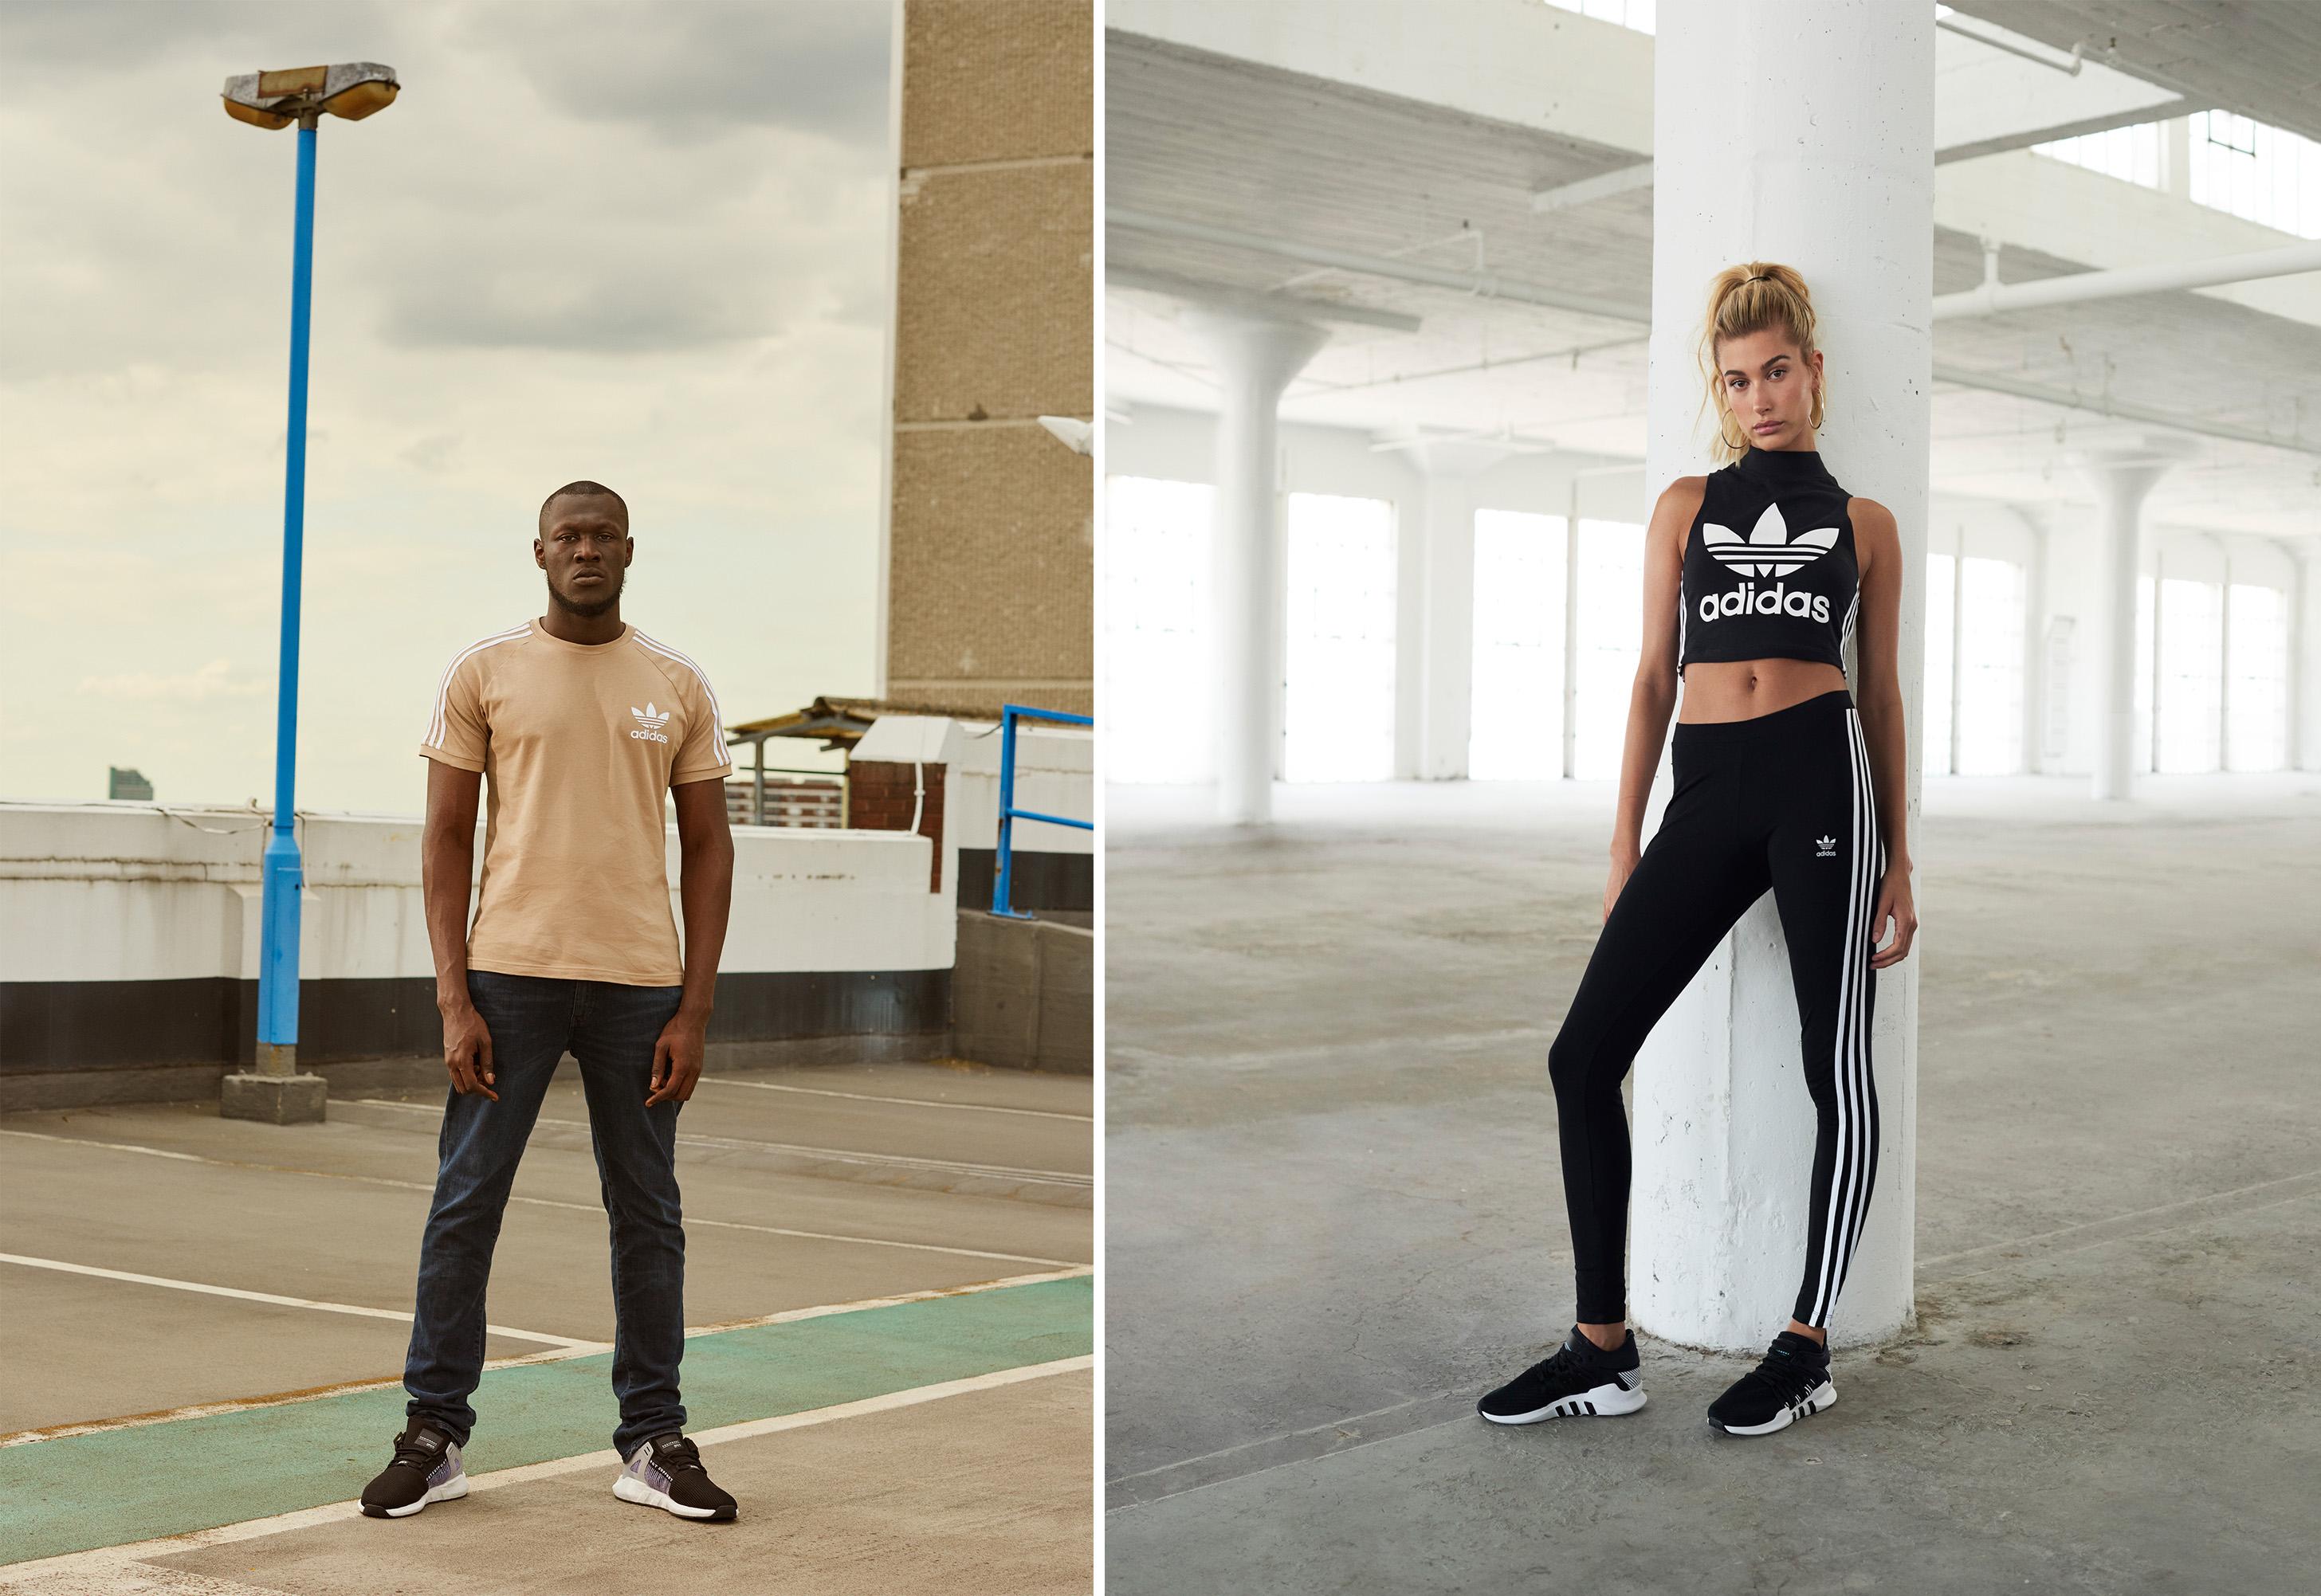 adidas jd sports eqt tap hailey baldwin and stormzy for eqt campaign wwd adidas jd sports eqt tap hailey